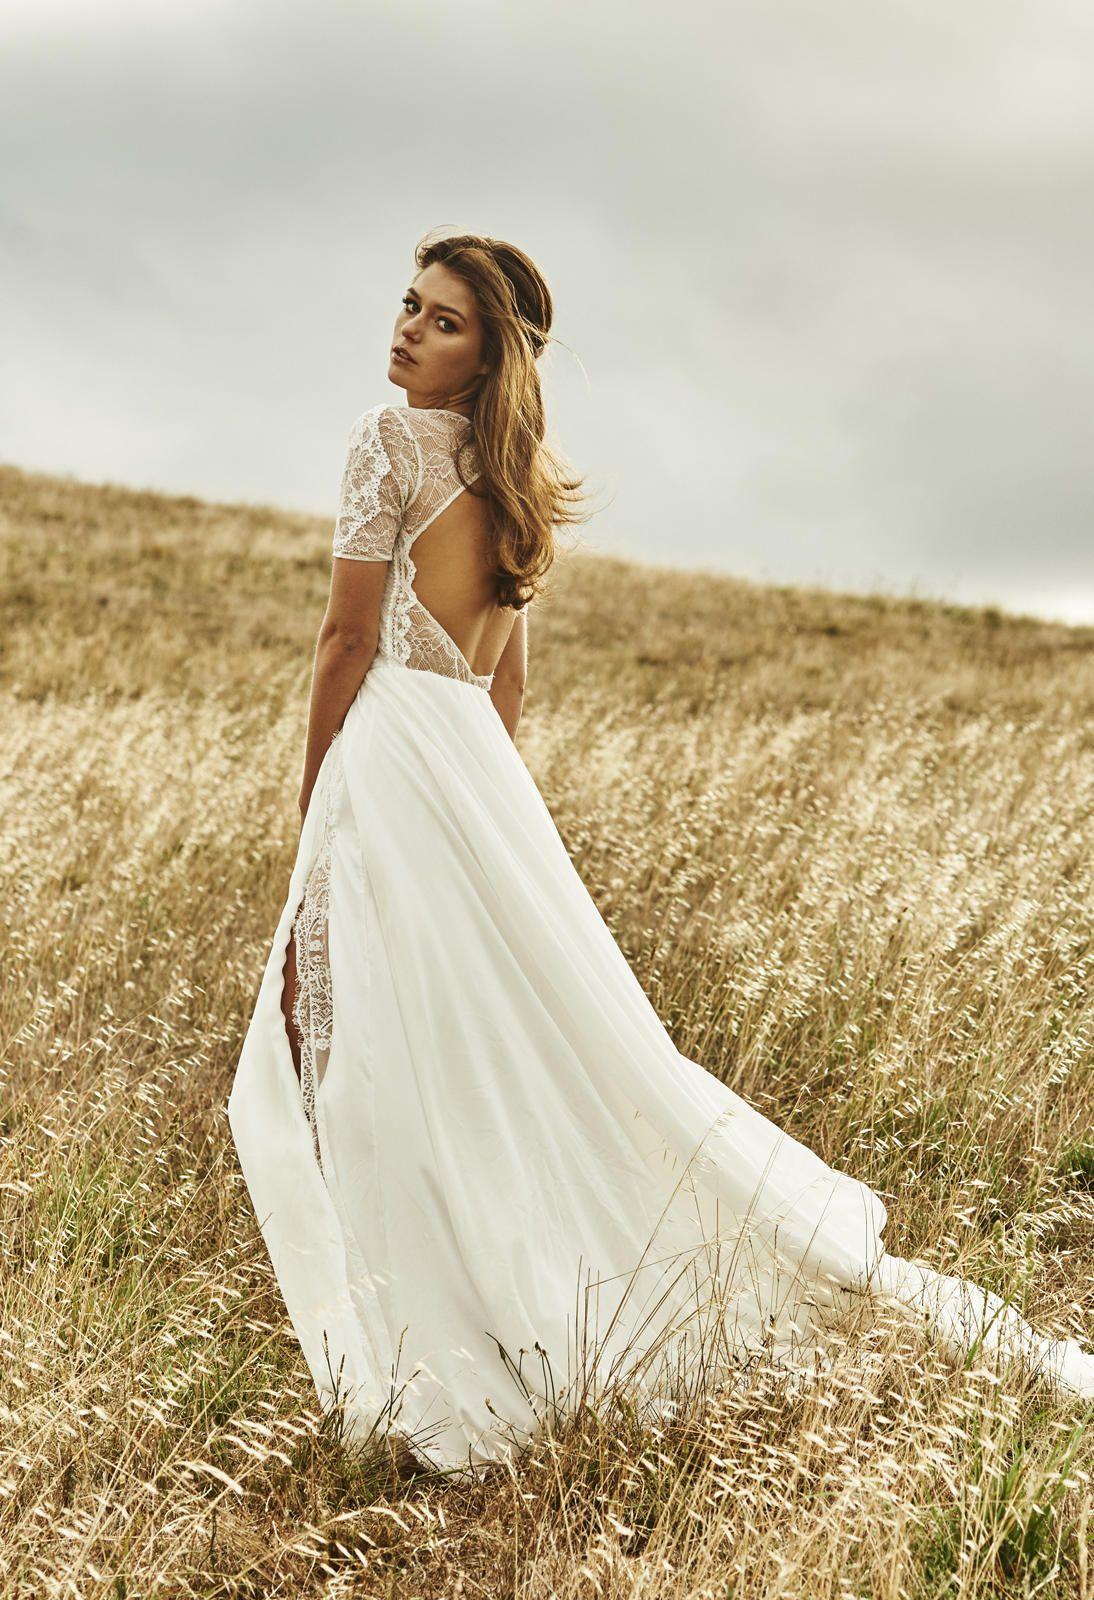 Grace loves lace wedding dresses wedding ideas pinterest